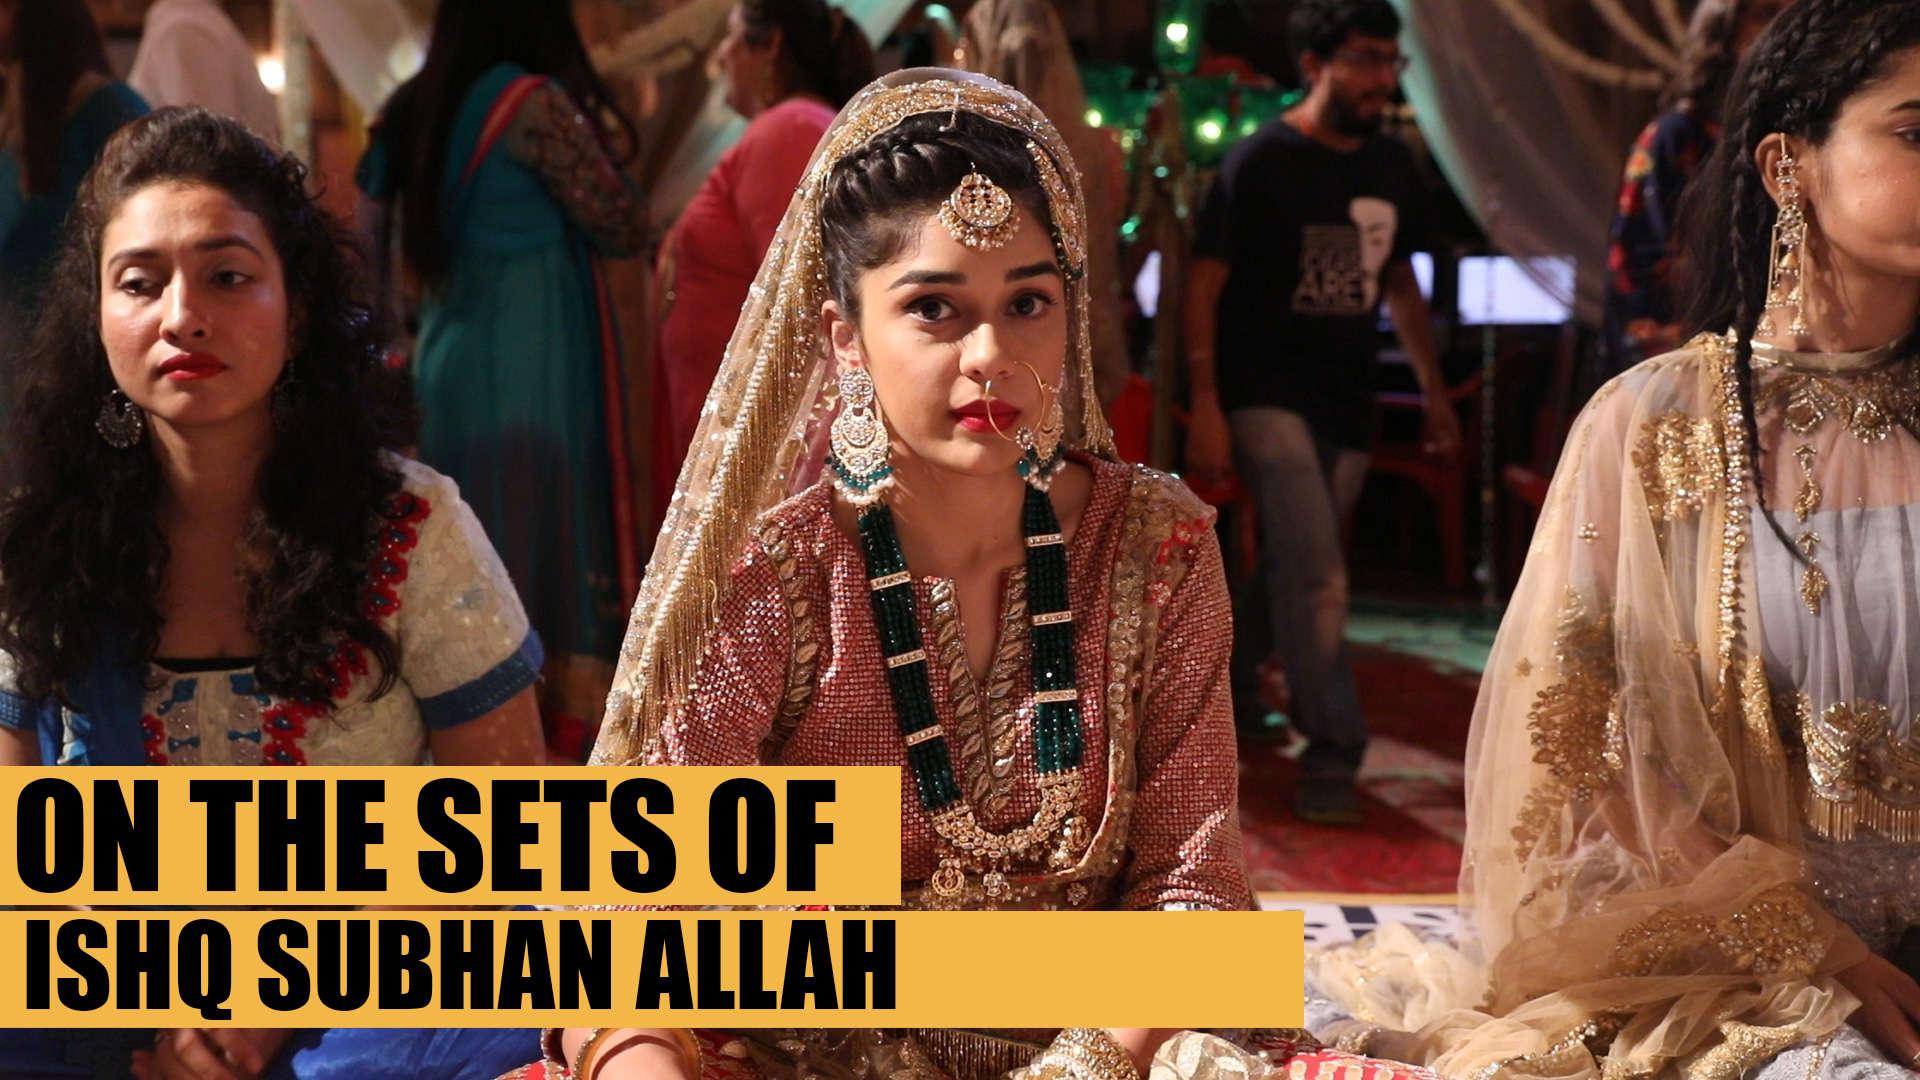 Ishq Subhan Allah Zara To Get Married To Zain Kabir Gets Upset Tv Times Of India Videos